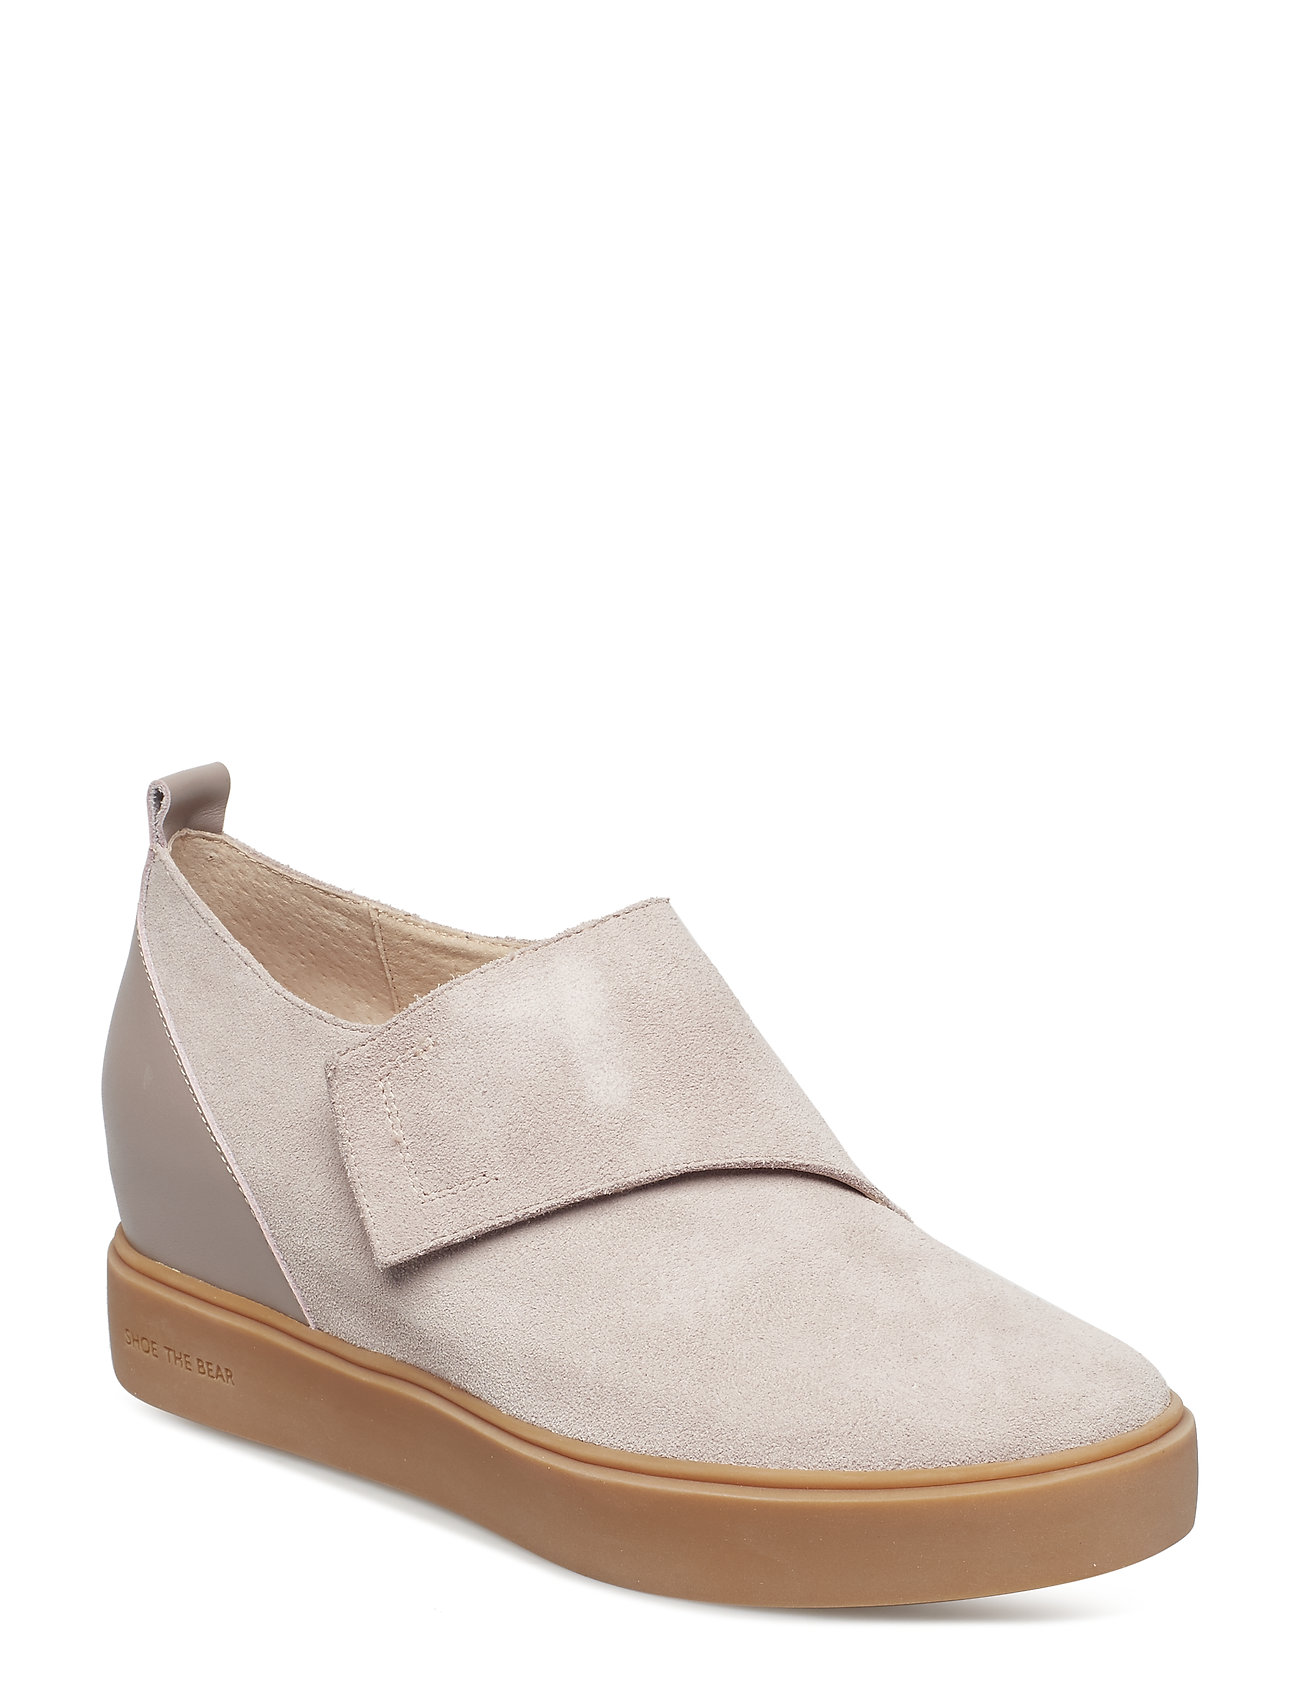 Image of Lisa S Sneakers Plateau Beige Shoe The Bear (3408577903)